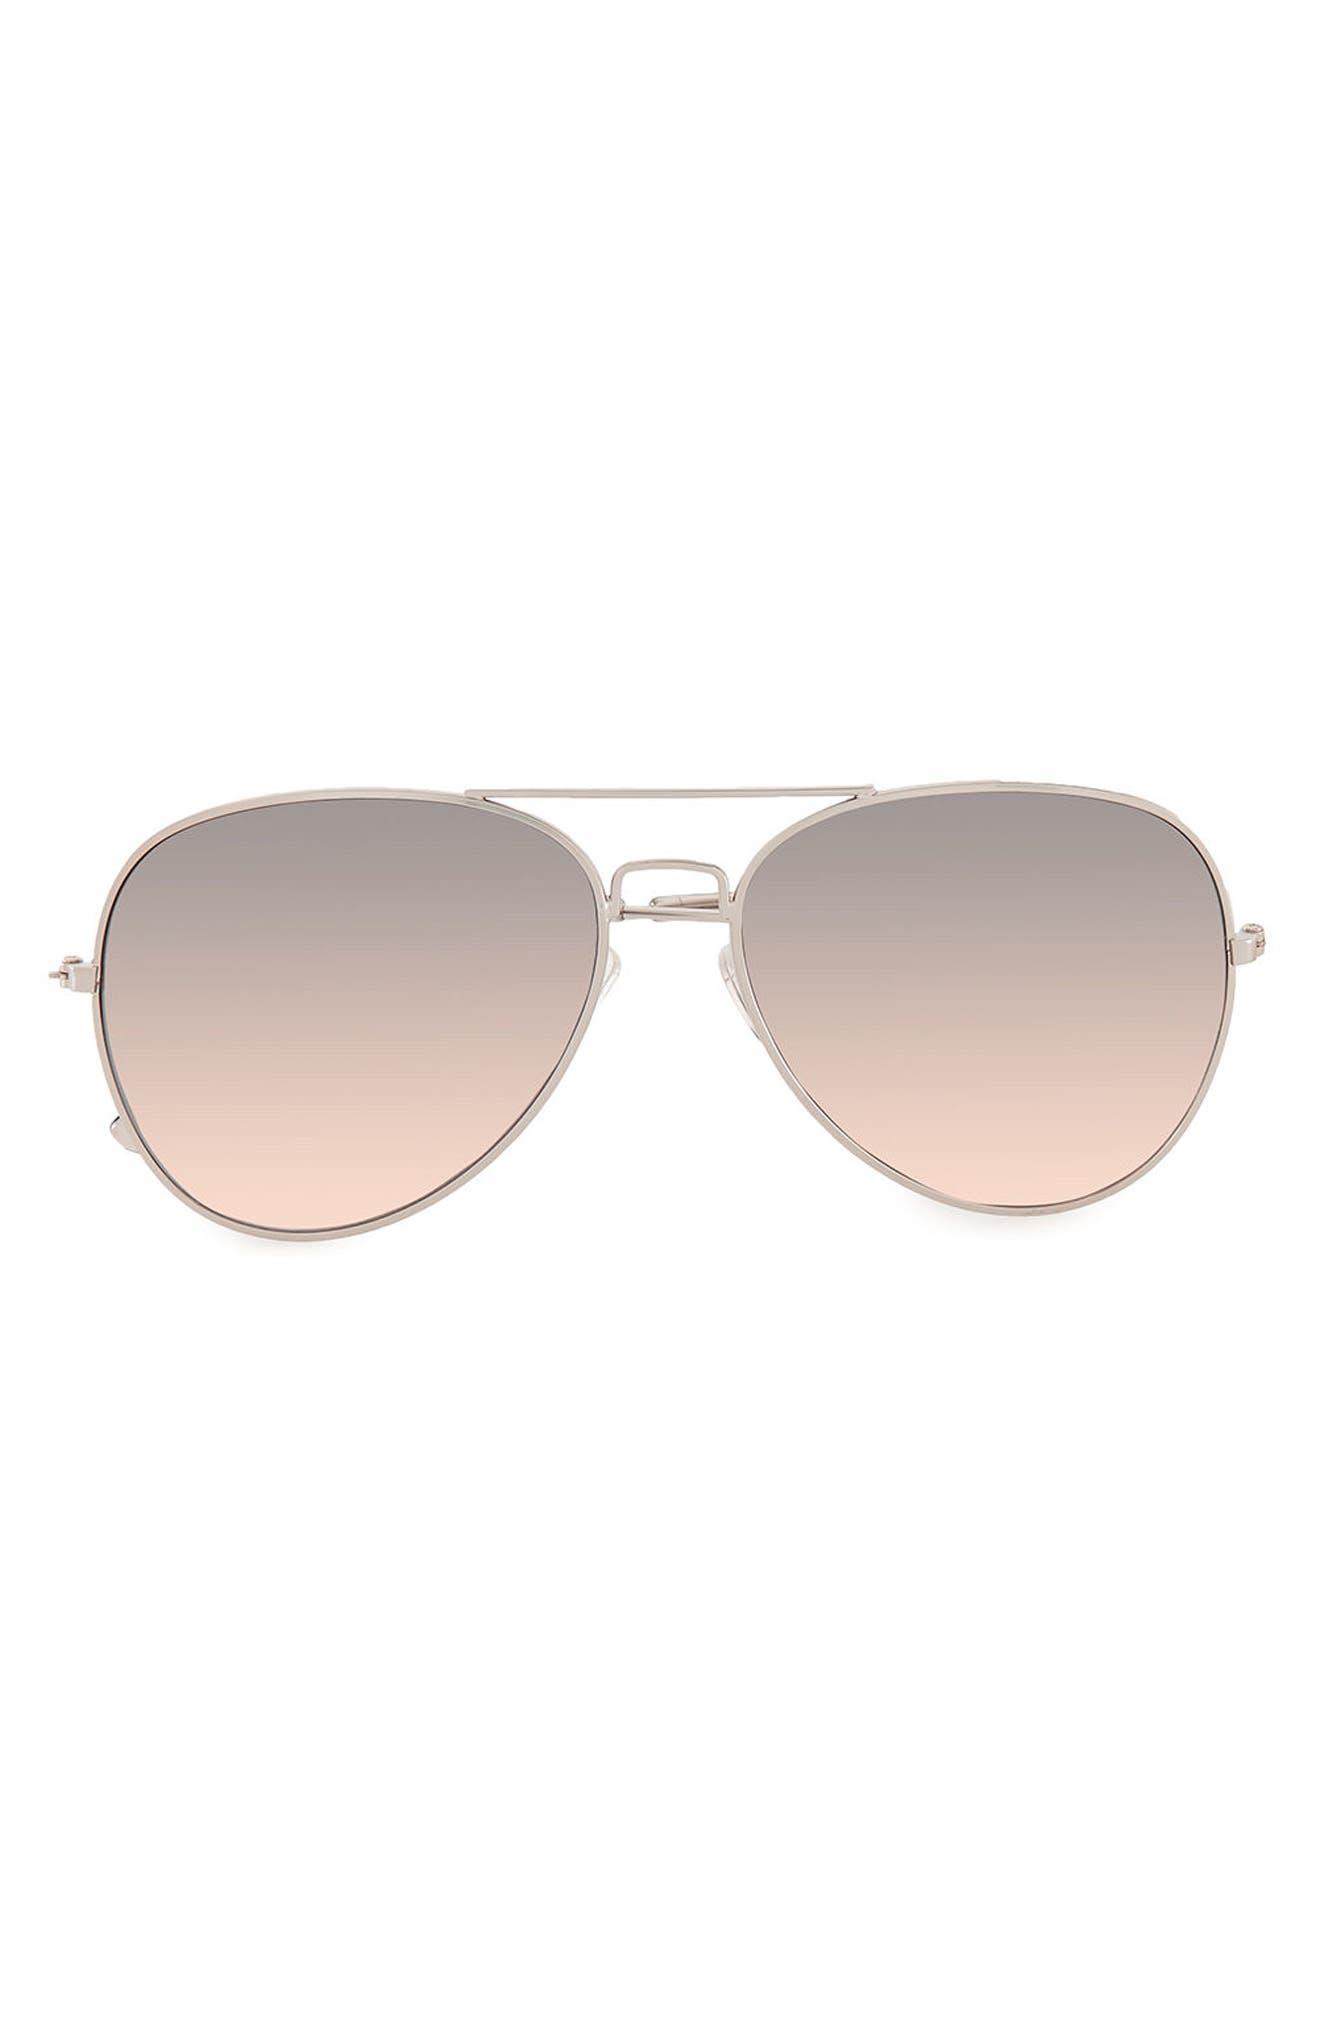 58mm Mirrored Aviator Sunglasses,                         Main,                         color, Metallic Silver